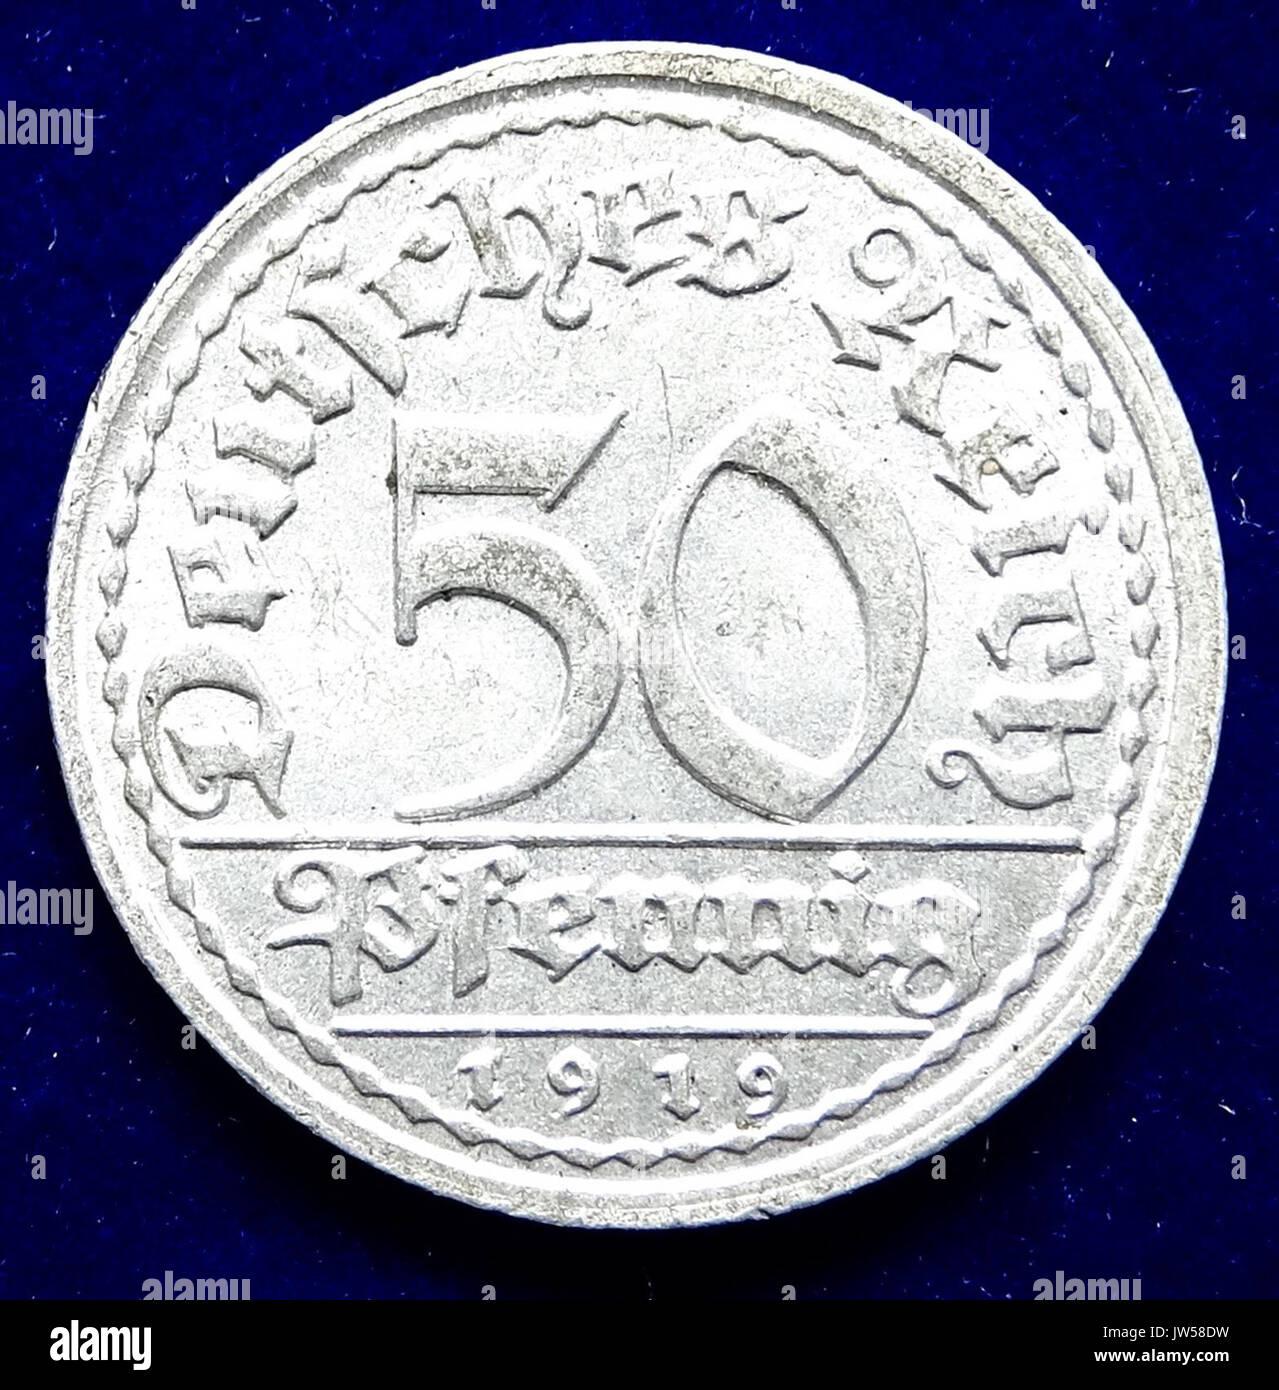 Weimarer Republik 50 Pfg 1919 D Al Münze Vorderseite Stockfoto Bild